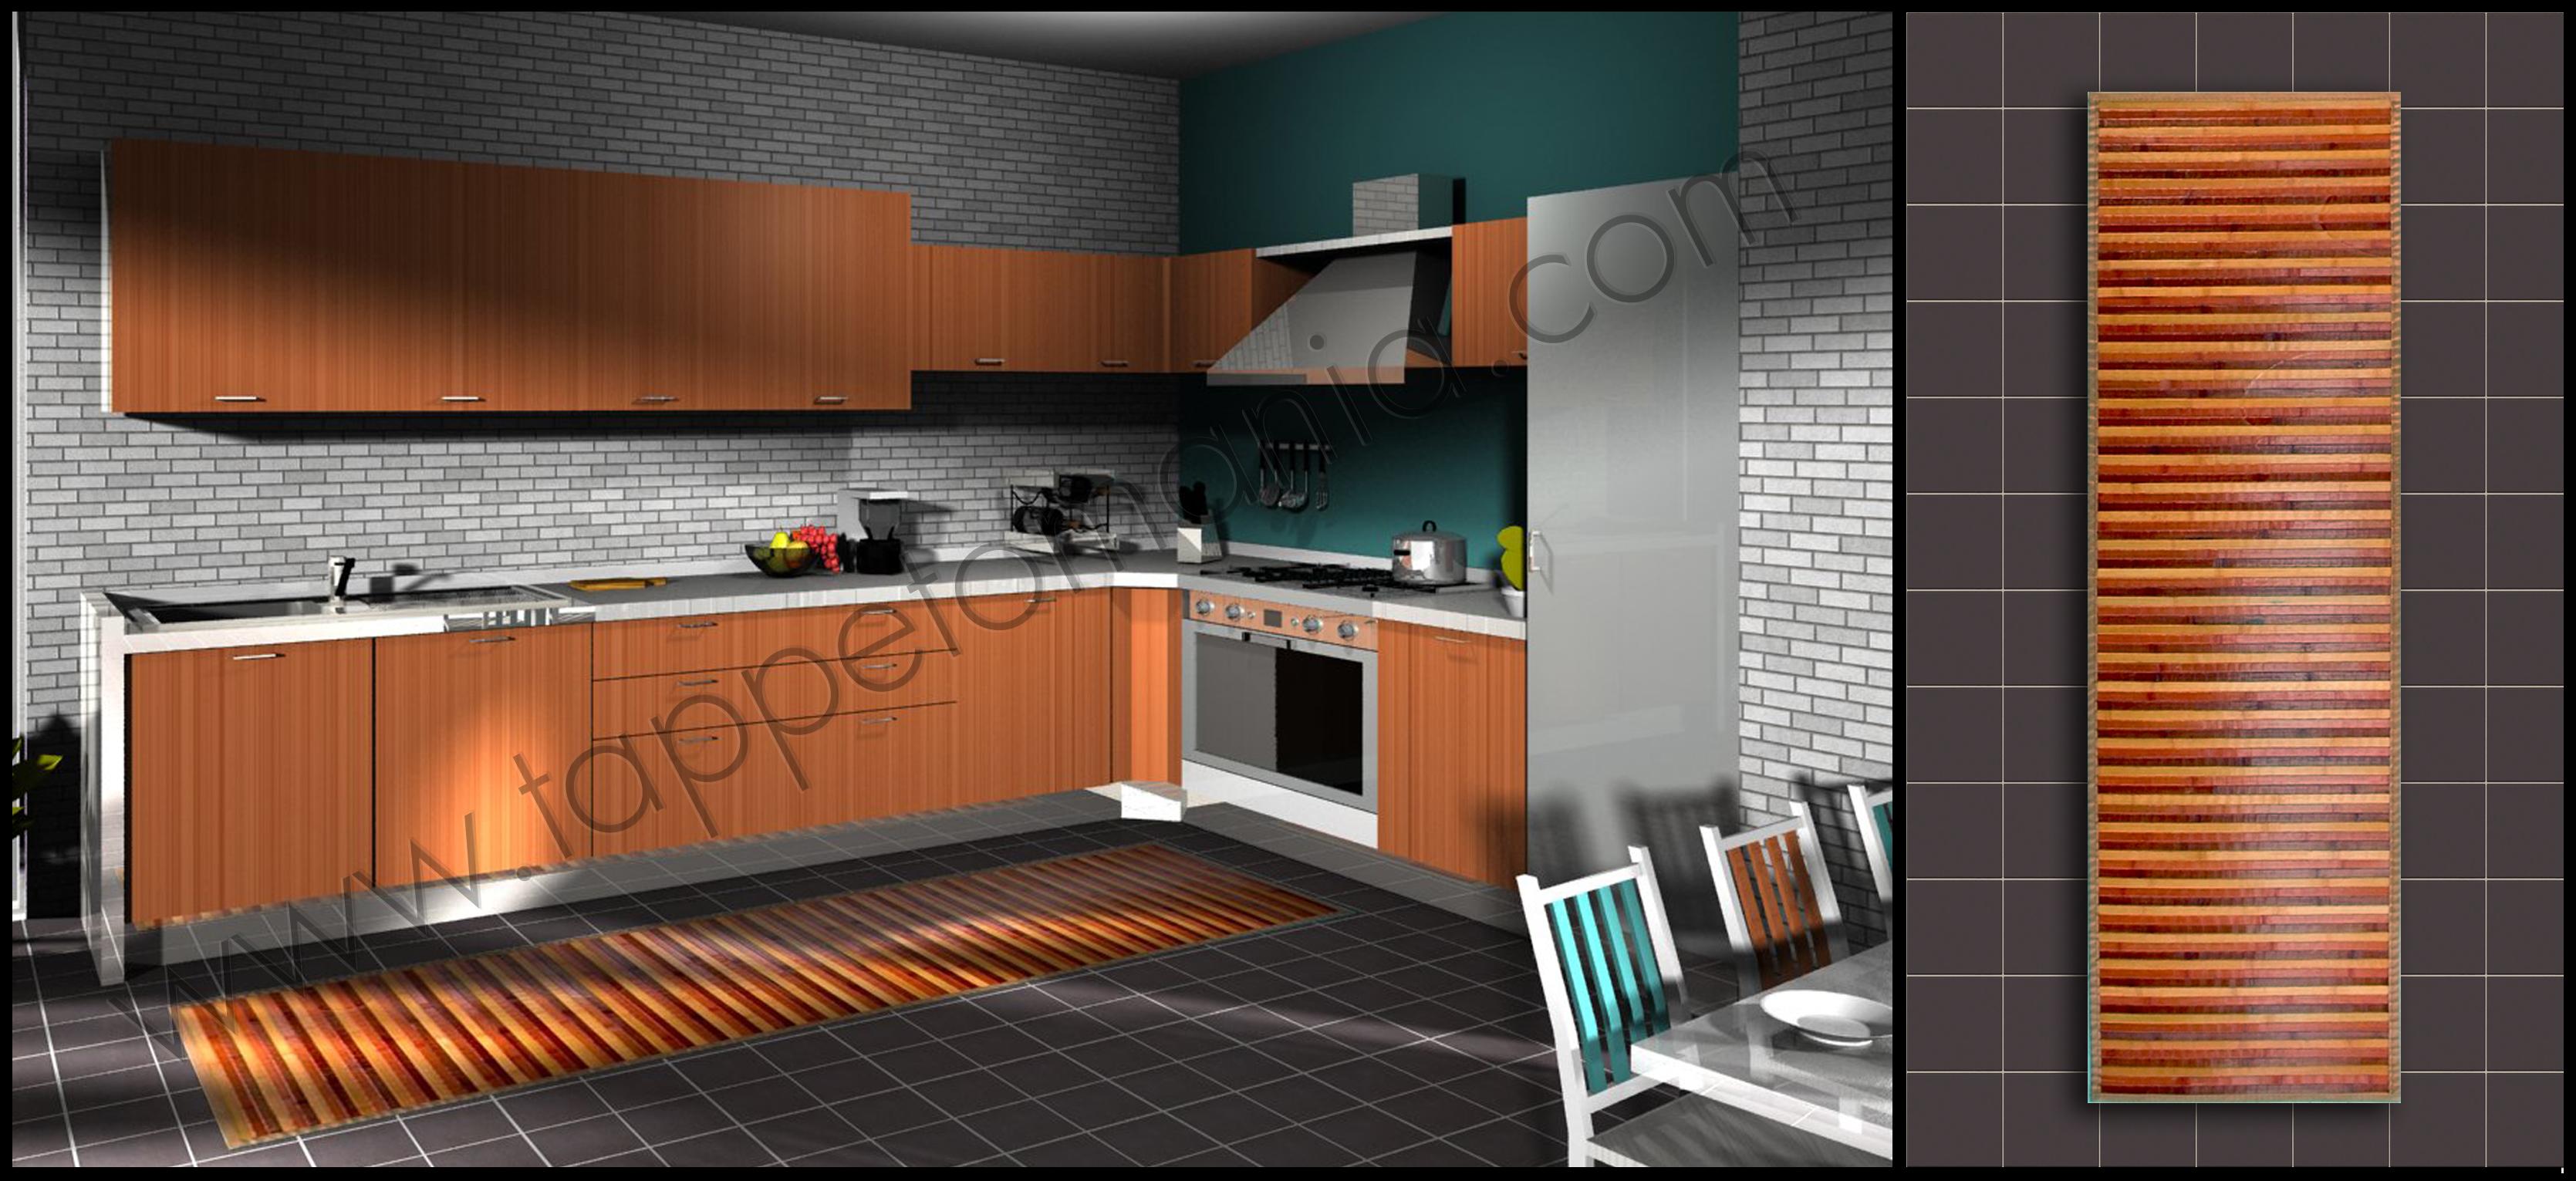 prezzi tappeti bamboo ebay : (bollengo) - Cucine Moderne Prezzi Bassi